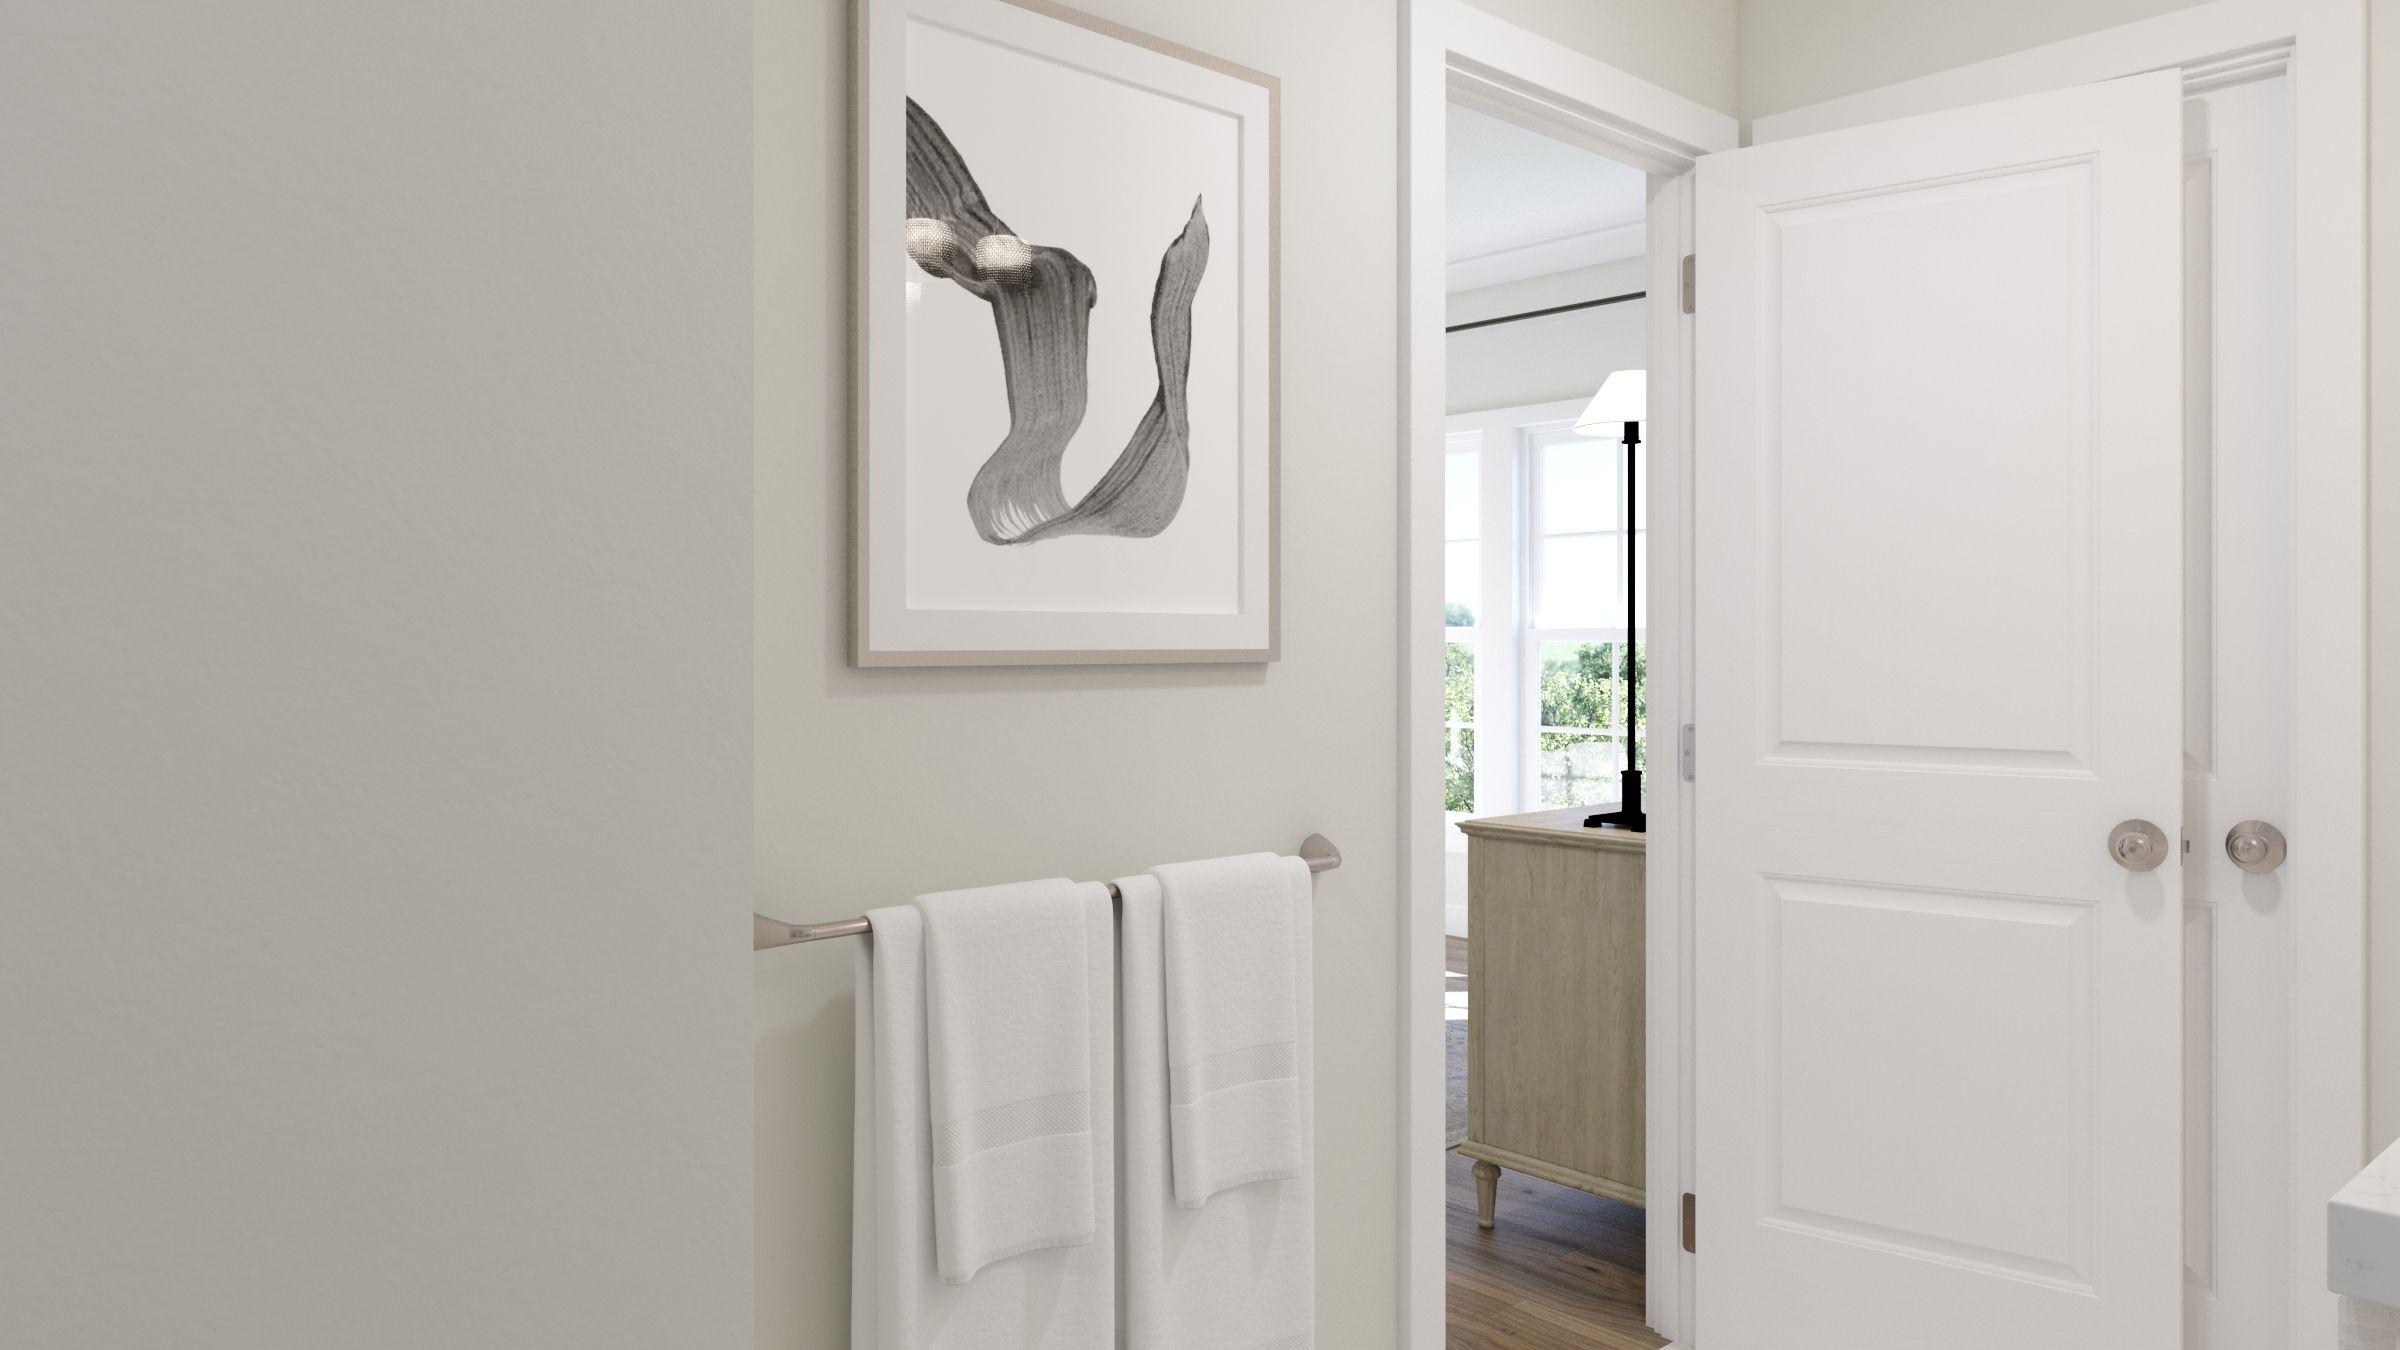 Bathroom featured in the Tristan By Van Metre Homes in Washington, VA